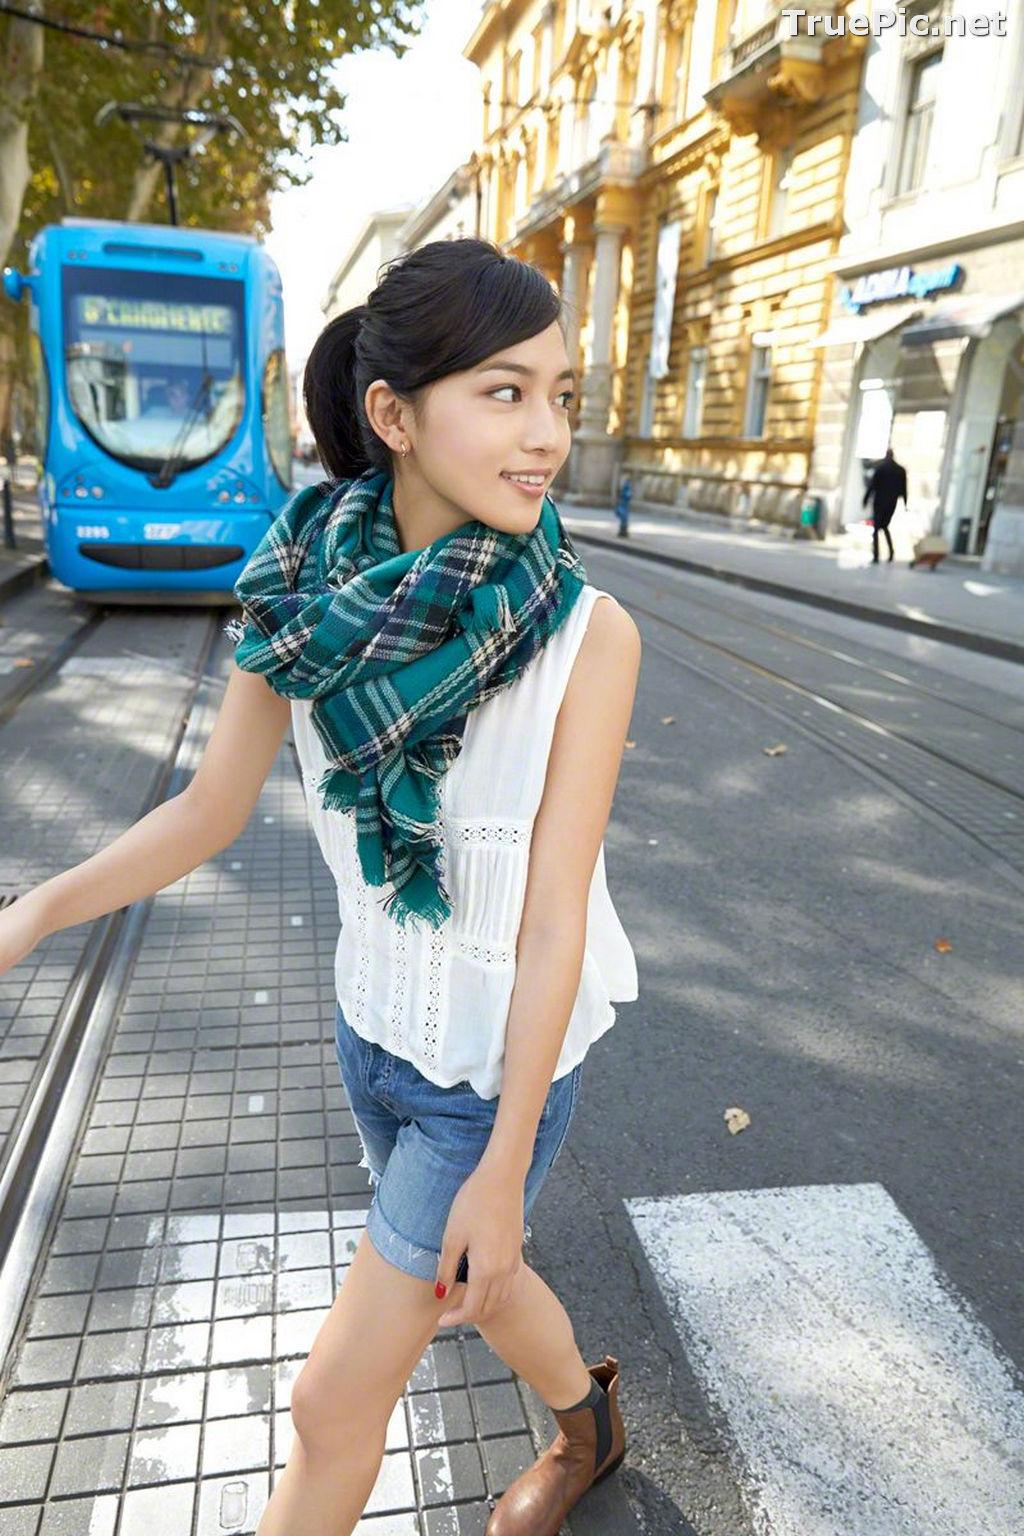 Image Wanibooks No.132 - Japanese Actress and Gravure Idol - Haruna Kawaguchi - TruePic.net - Picture-1